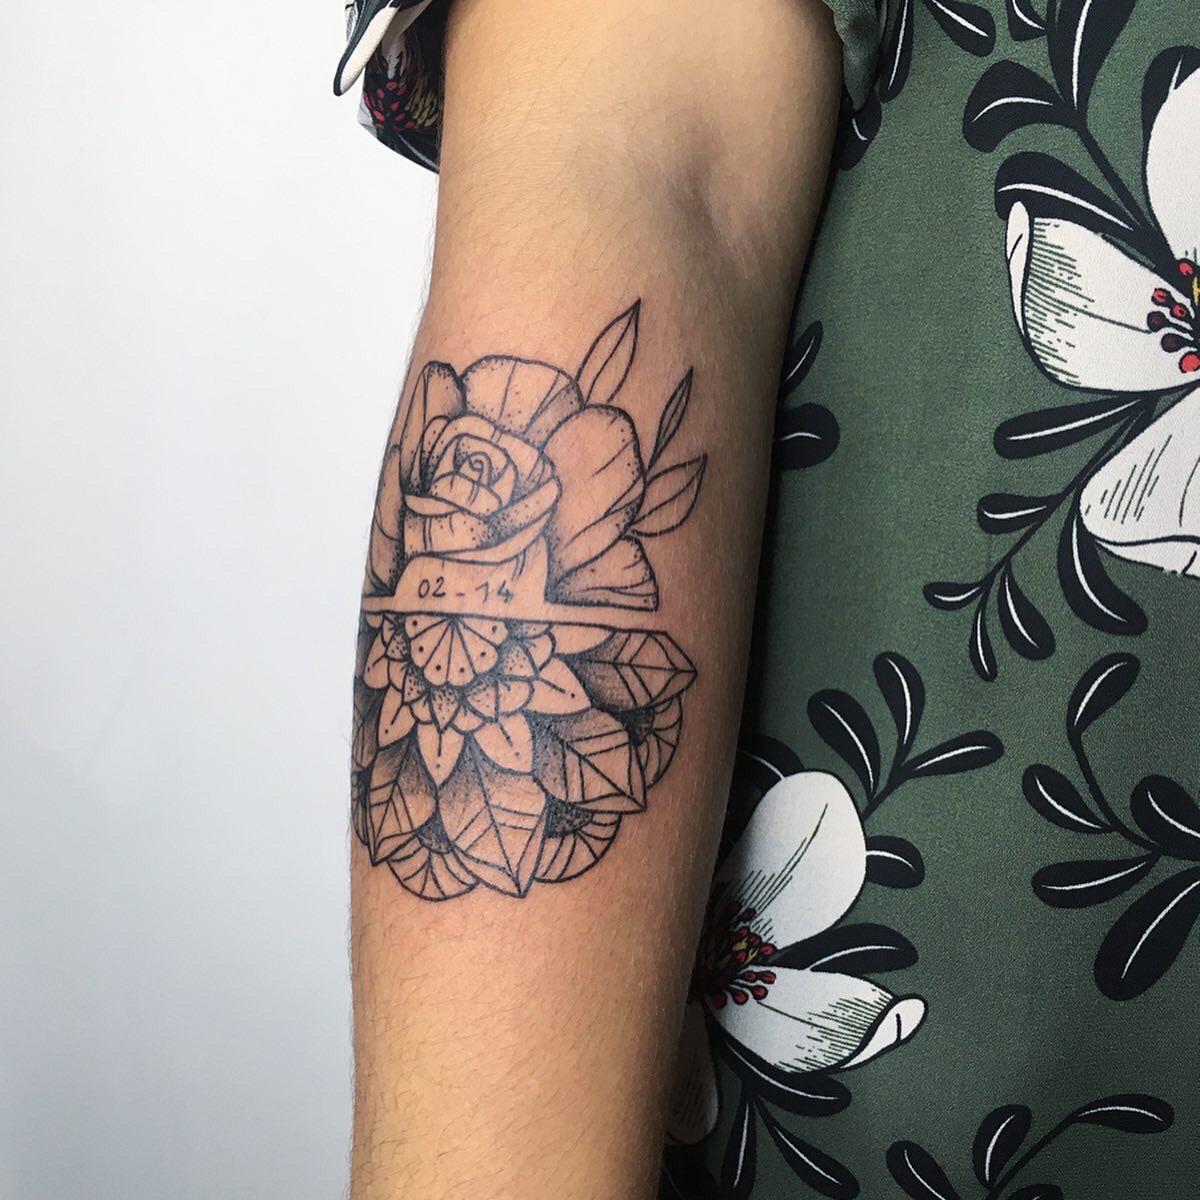 lindelebile-tattoo-pau-fleurs